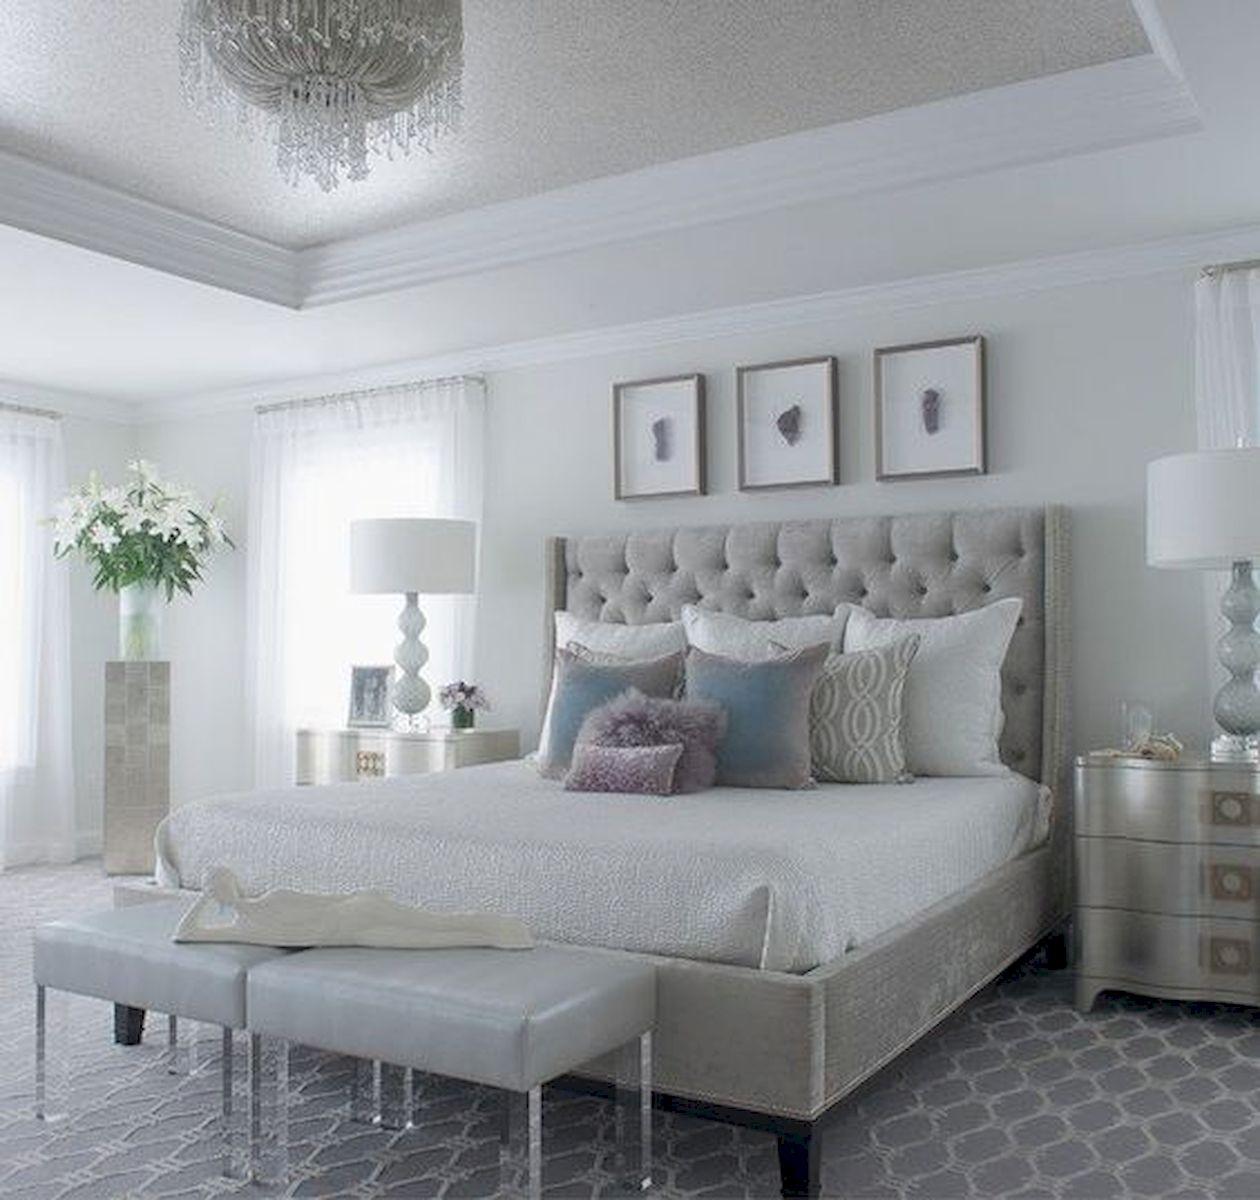 60 Beautiful Bedroom Decor and Design Ideas (25)